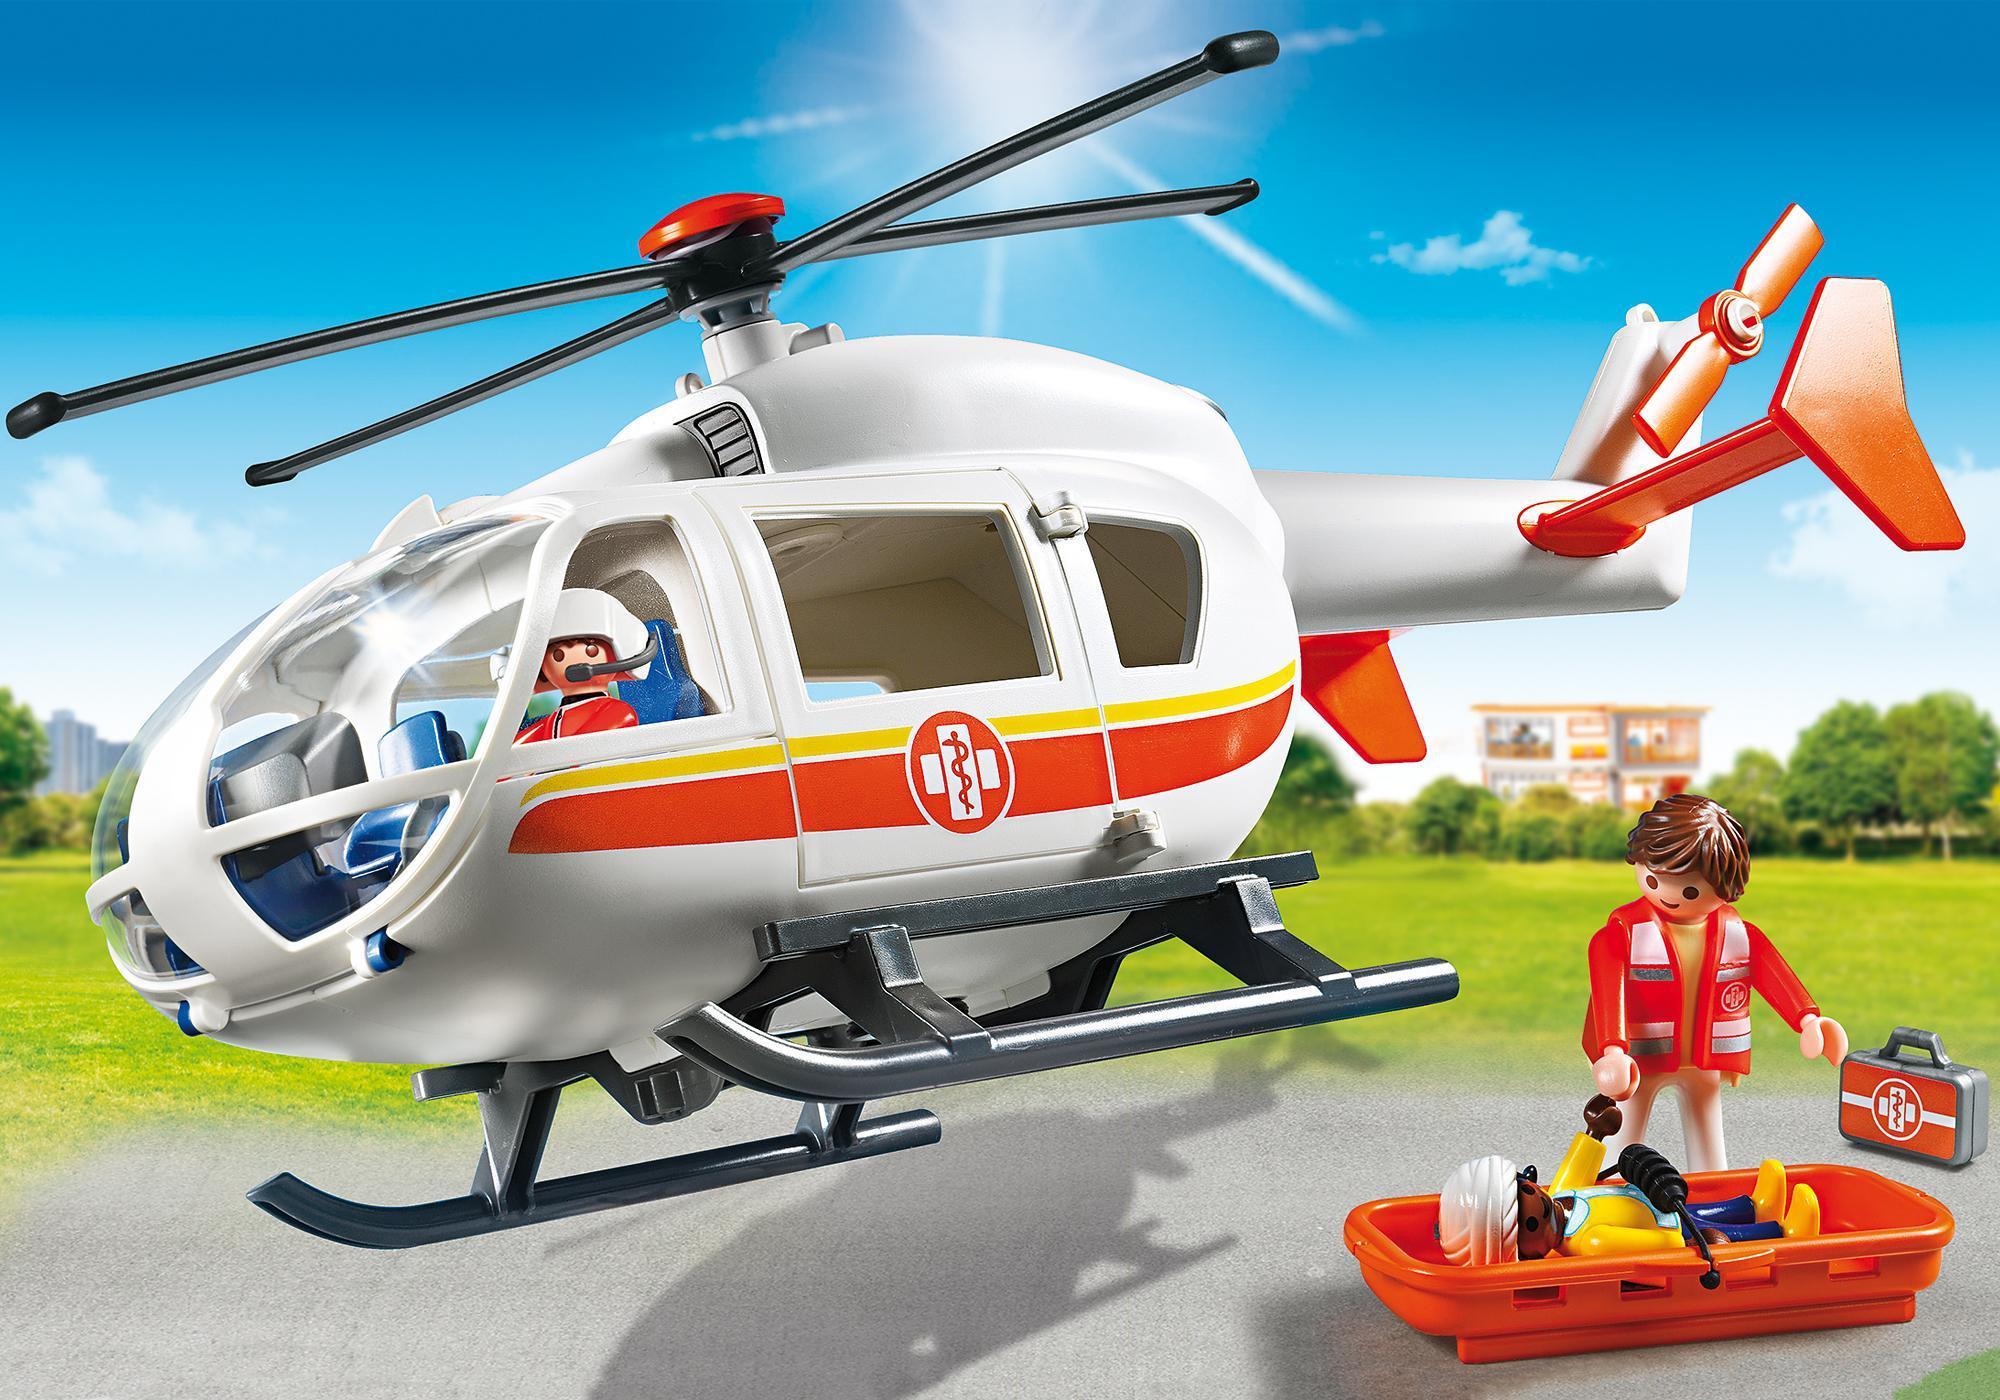 6686_product_detail/Ελικόπτερο πρώτων βοηθειών